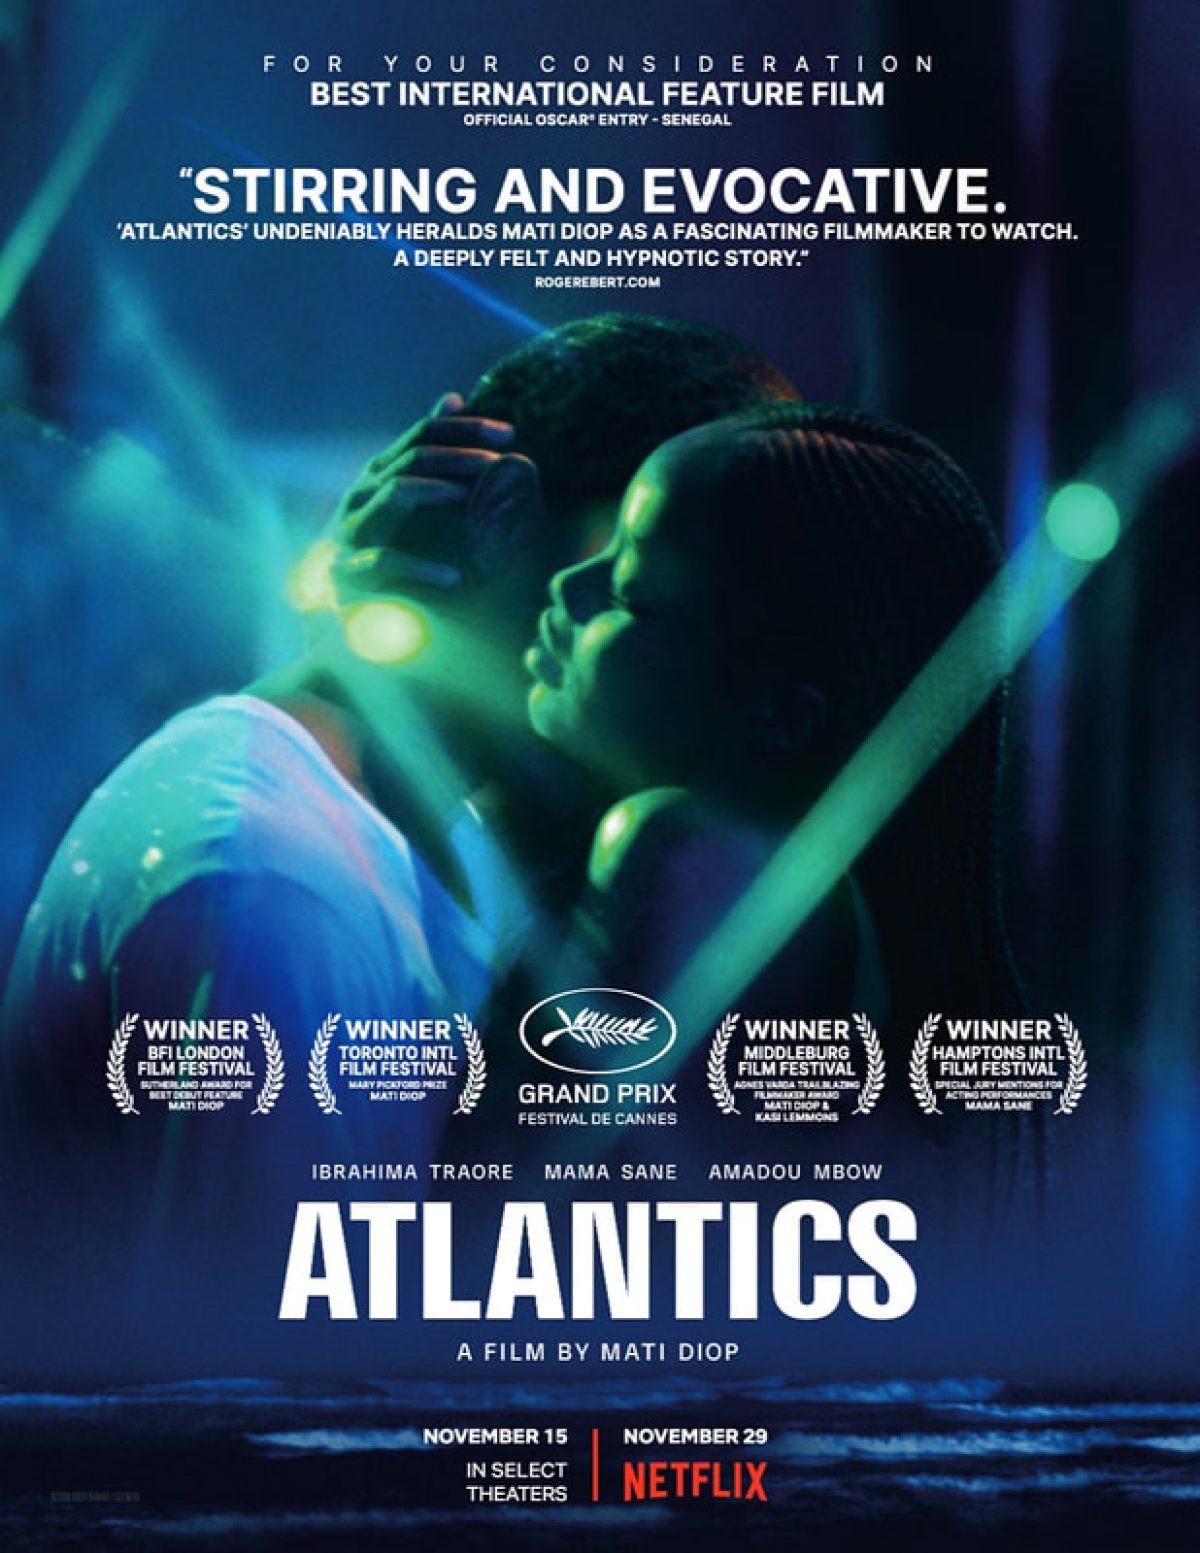 ATLANTICS [Atlantique]